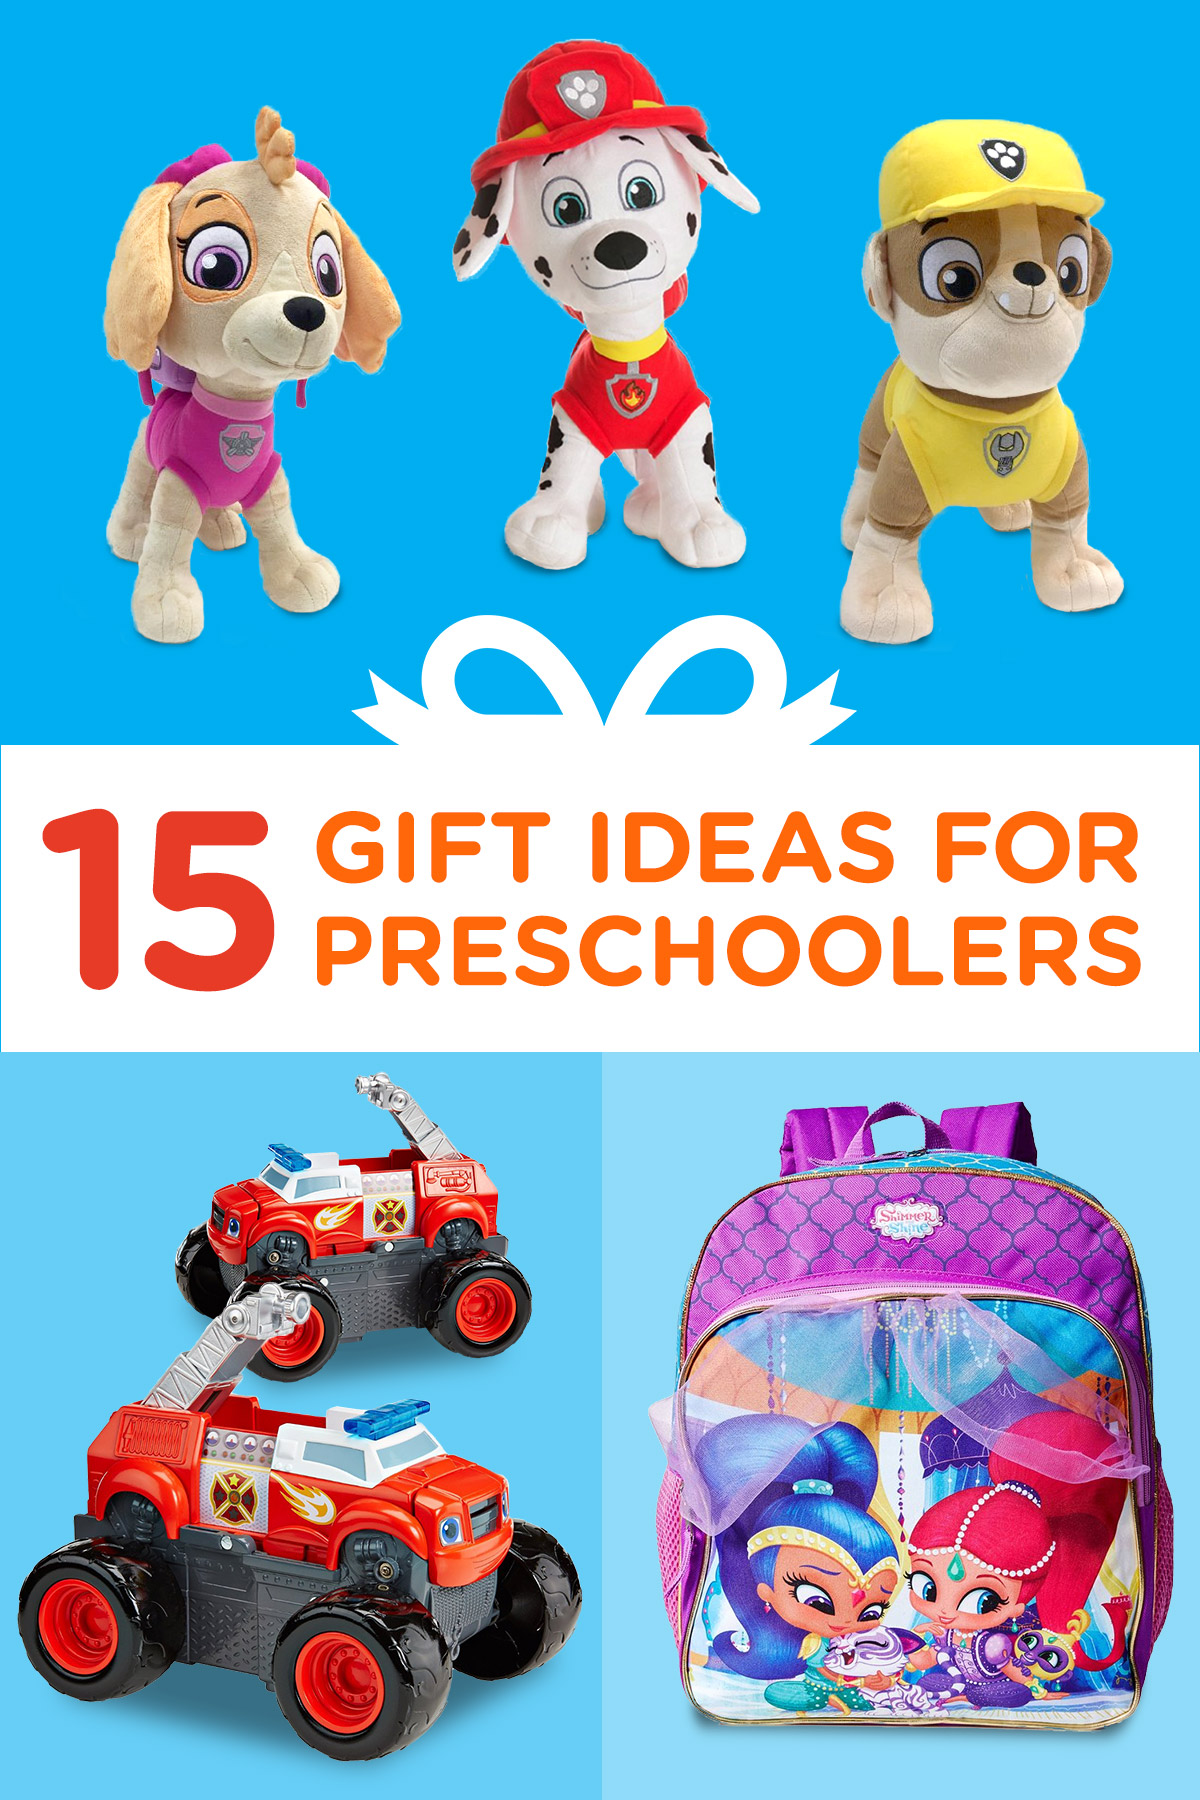 15 Birthday Gift Ideas for Preschoolers